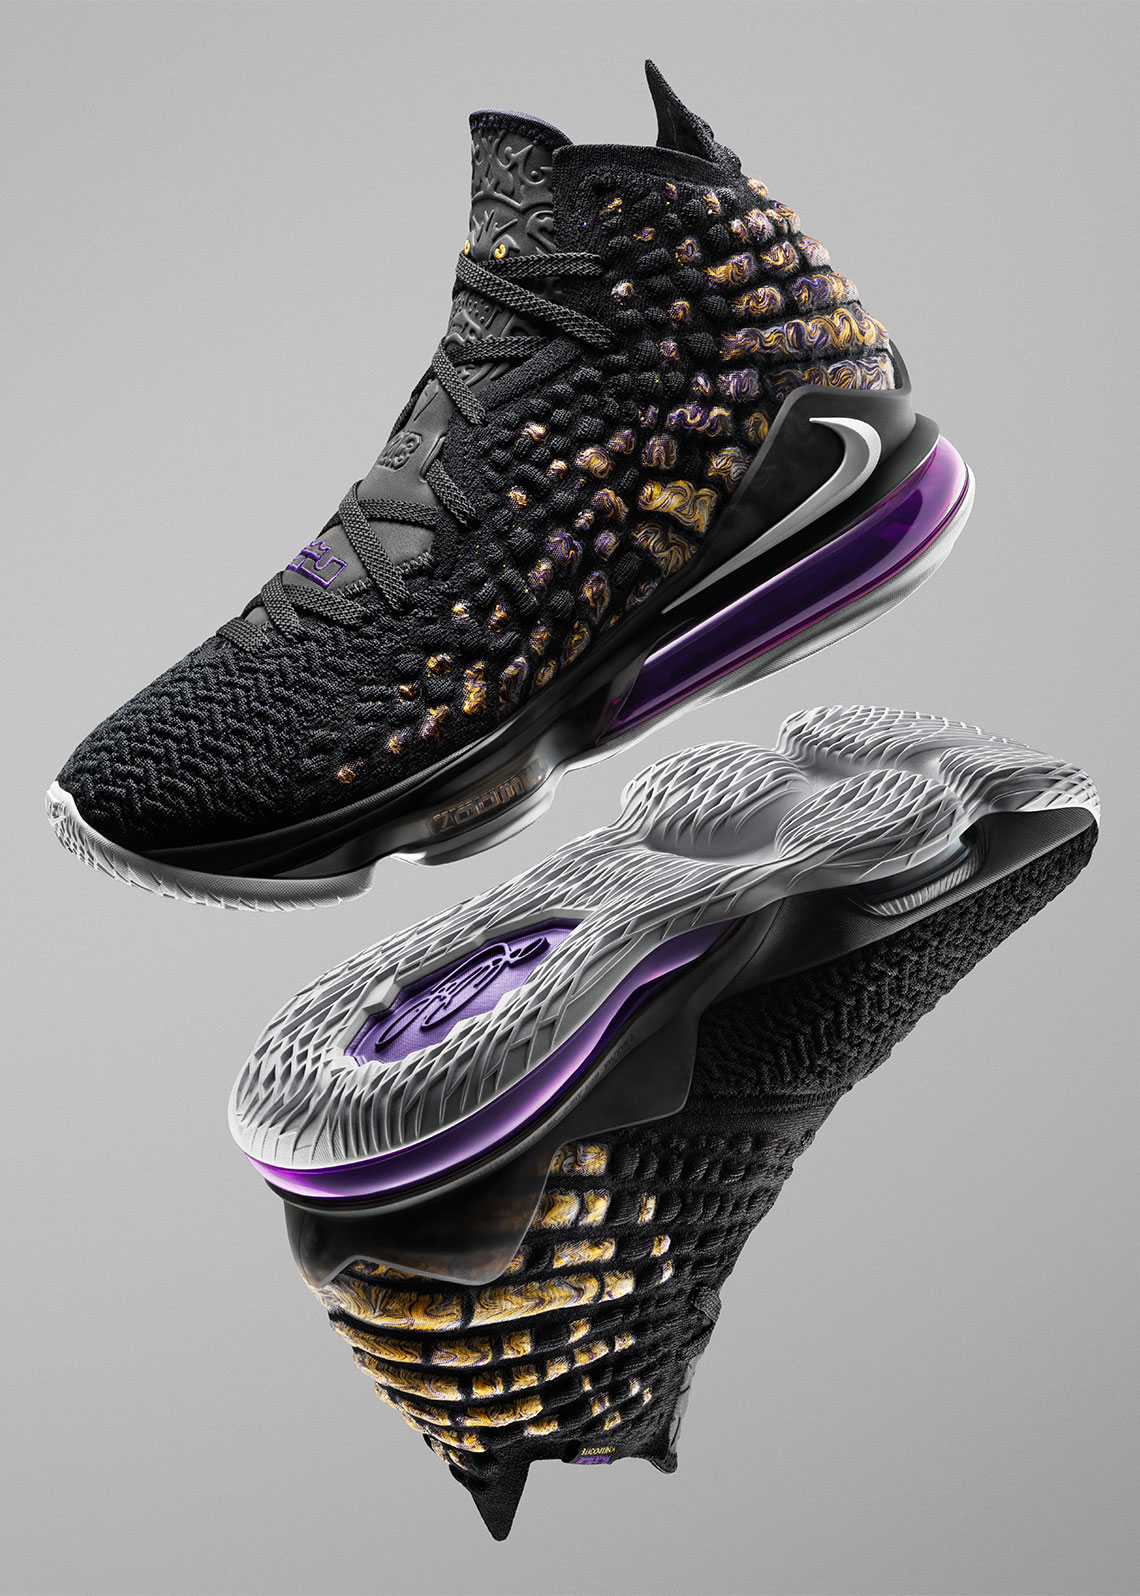 Nike LeBron 17 Lakers Purple Yellow